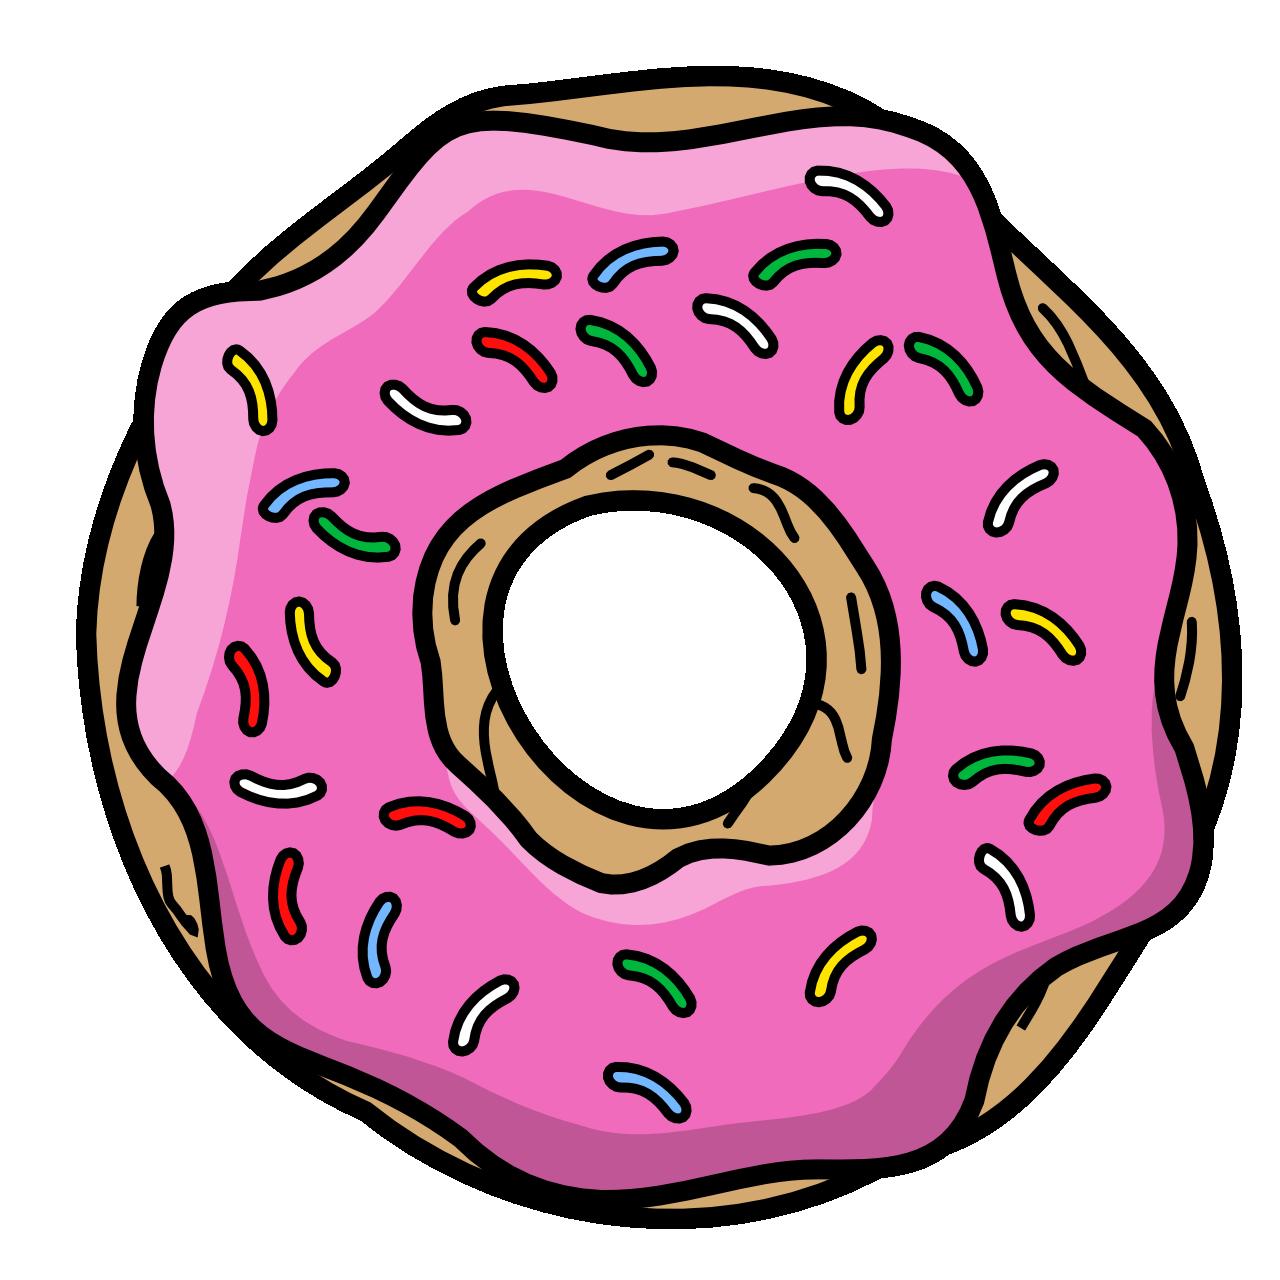 Doughnut clipart food. Donut icon web icons